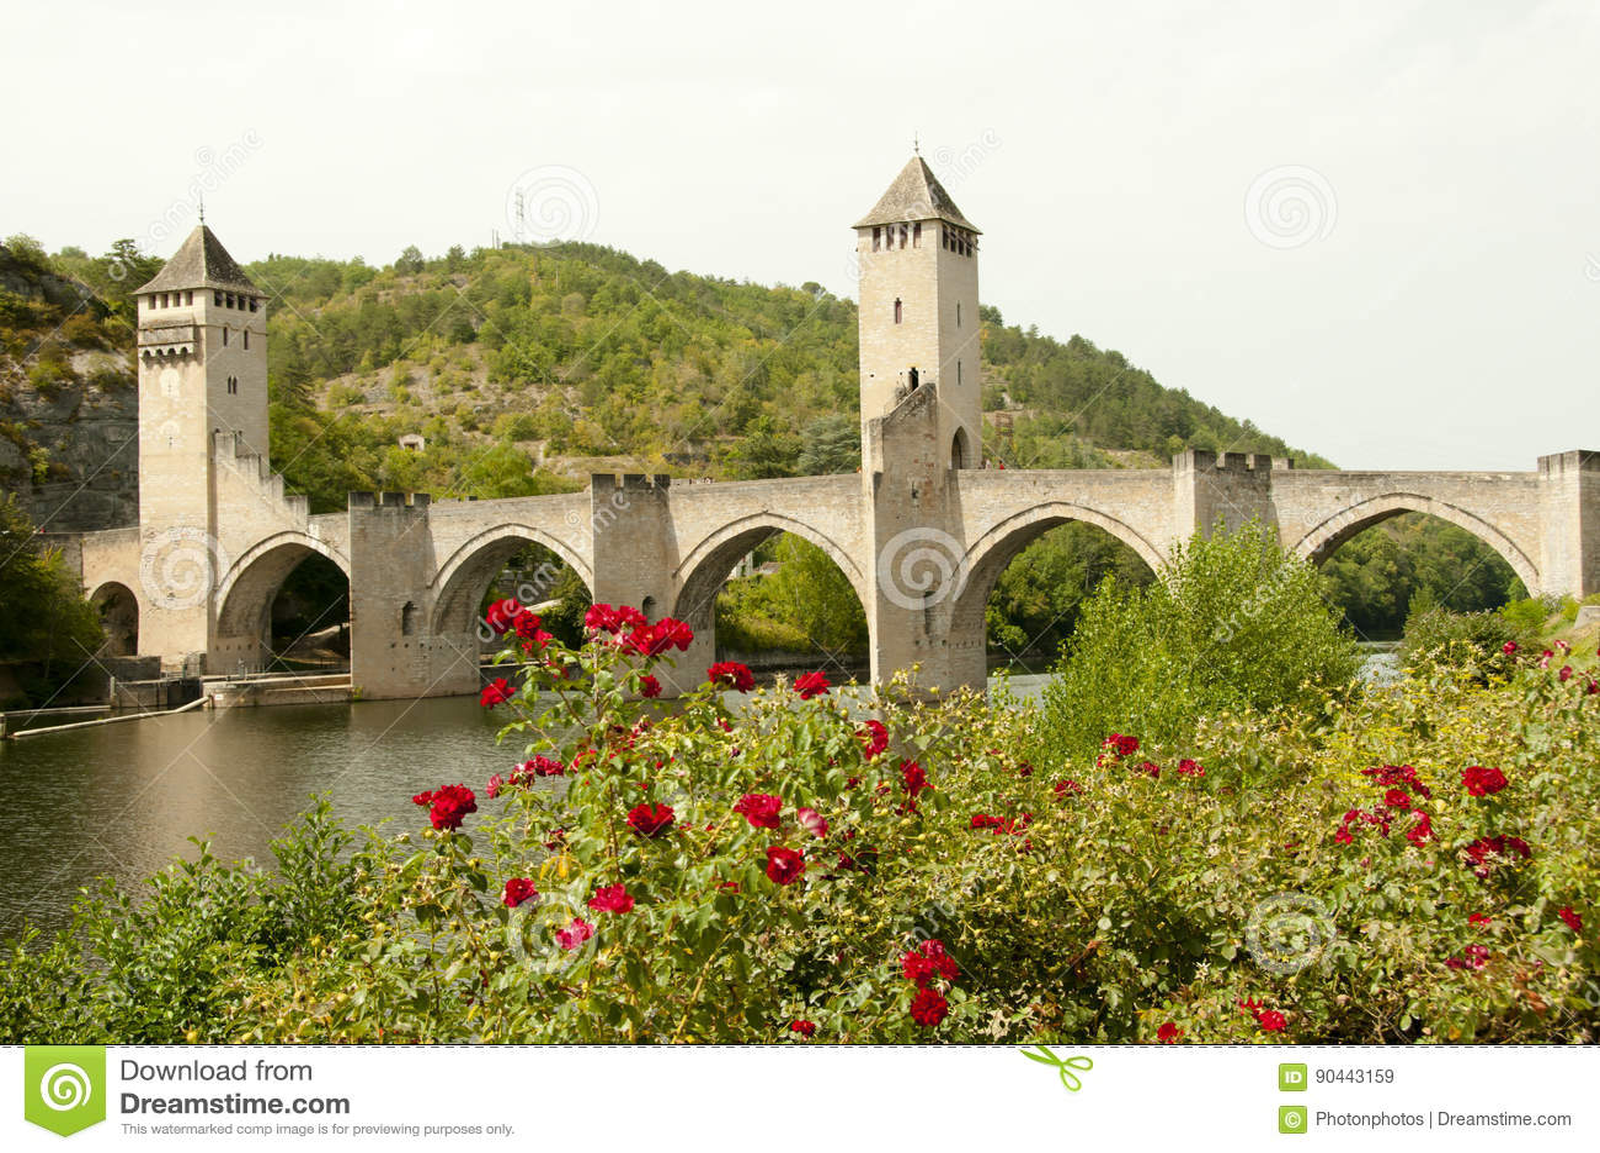 valentre bridge in cahors france stock photography 36273428. Black Bedroom Furniture Sets. Home Design Ideas